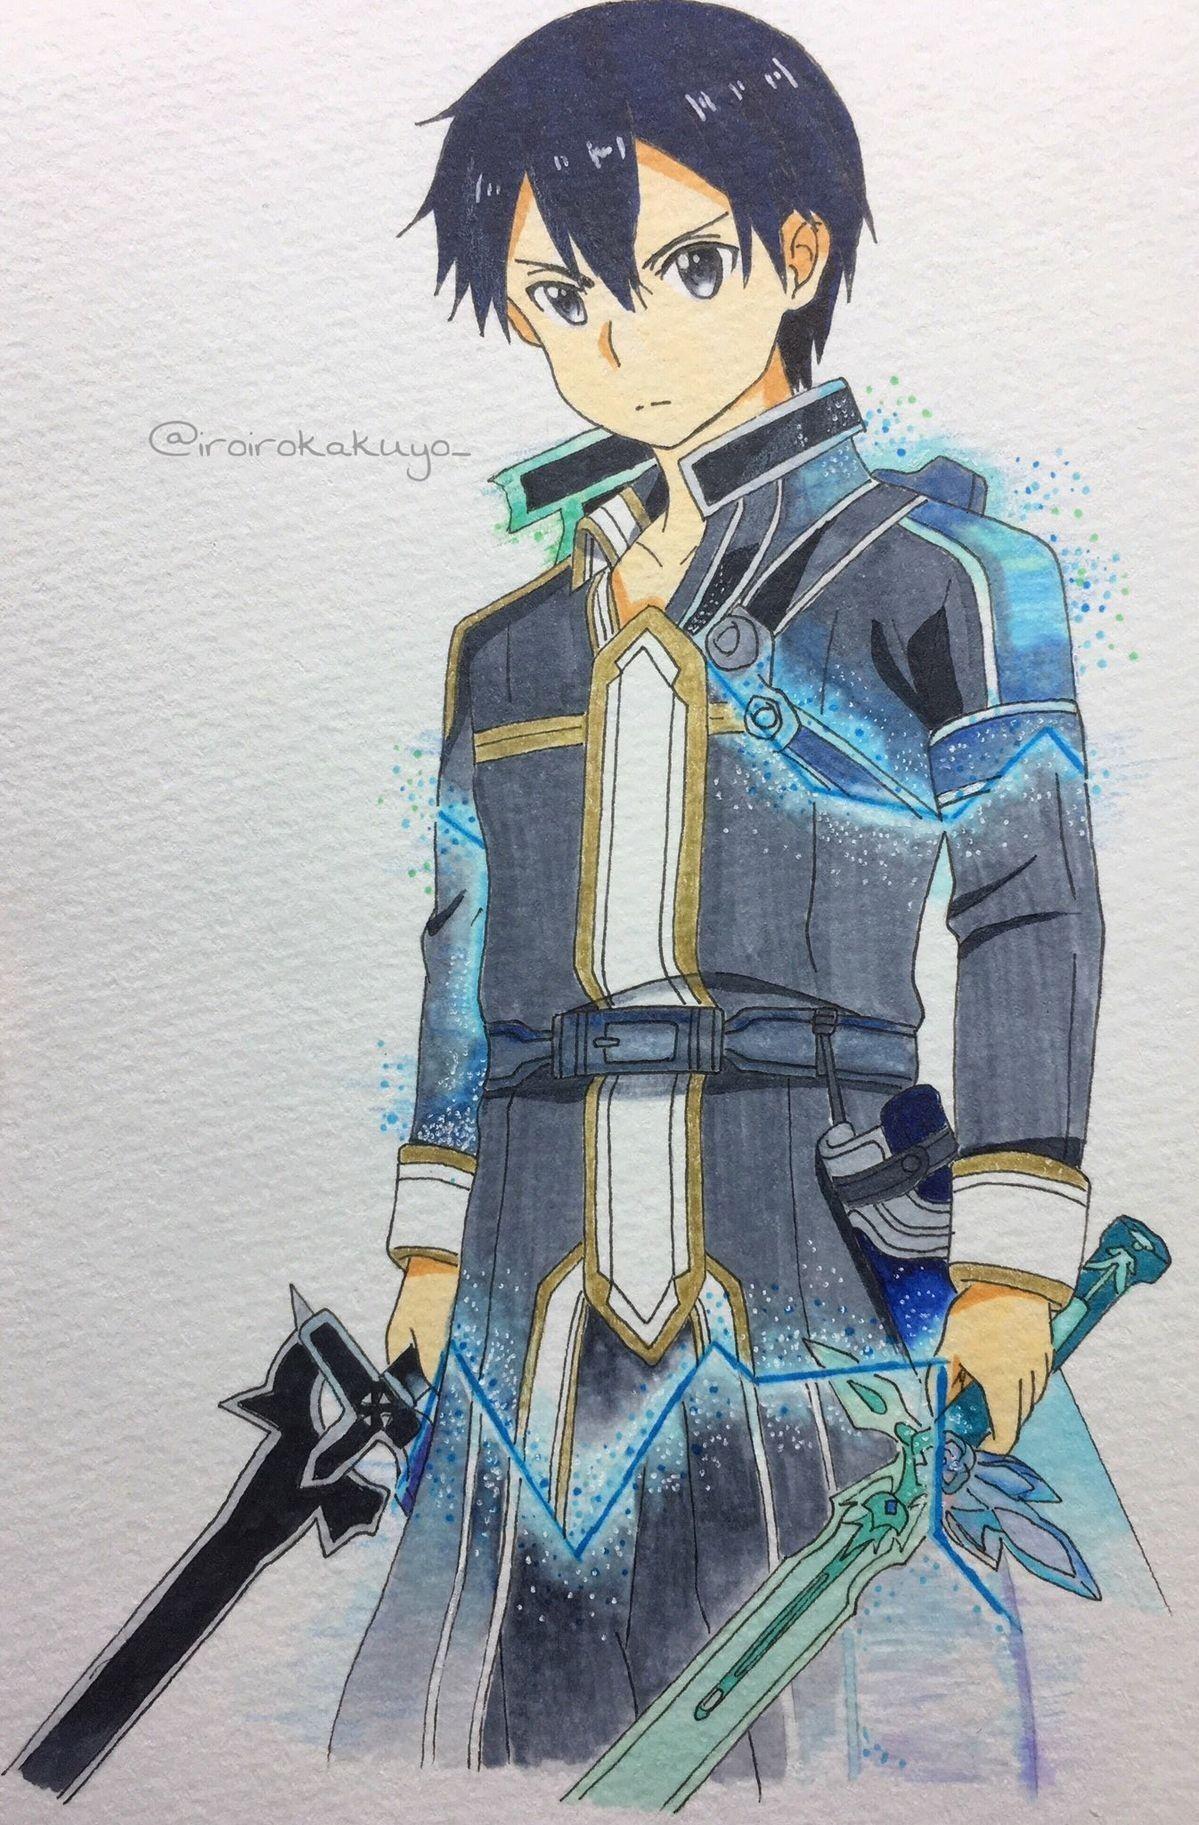 Pin by Tsang Eric on 卡通/Cosplay Sword art, Sword art